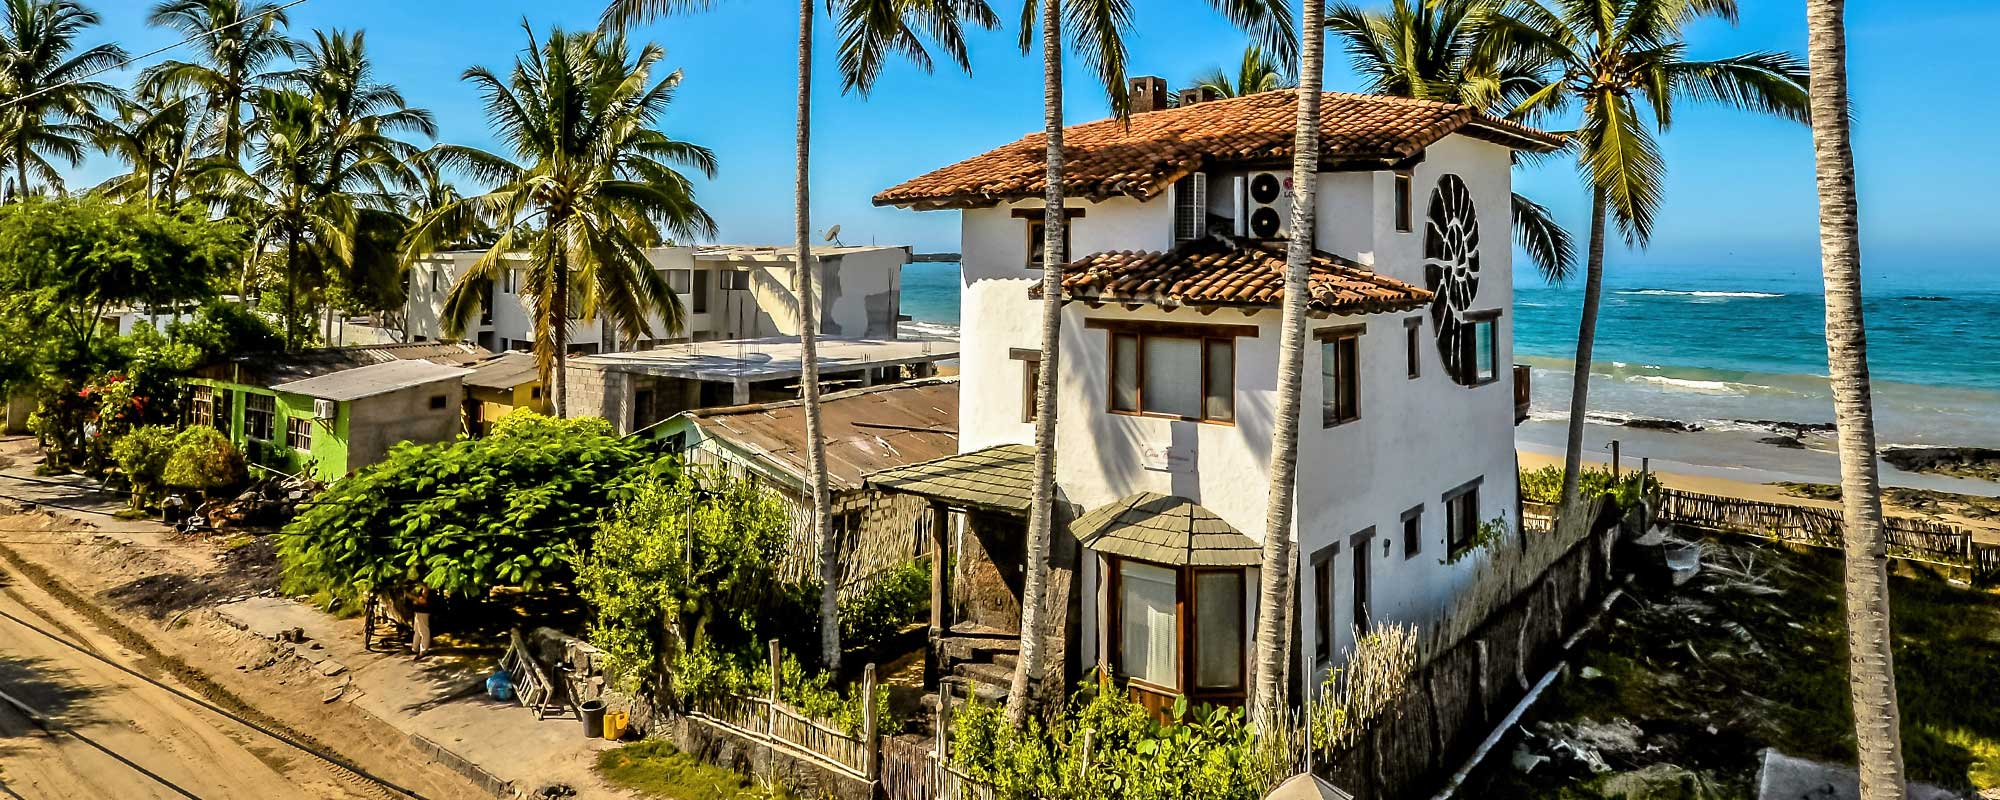 casa-baronesa-banner-01 Casa Baronesa Waterfront Villa - Isabela